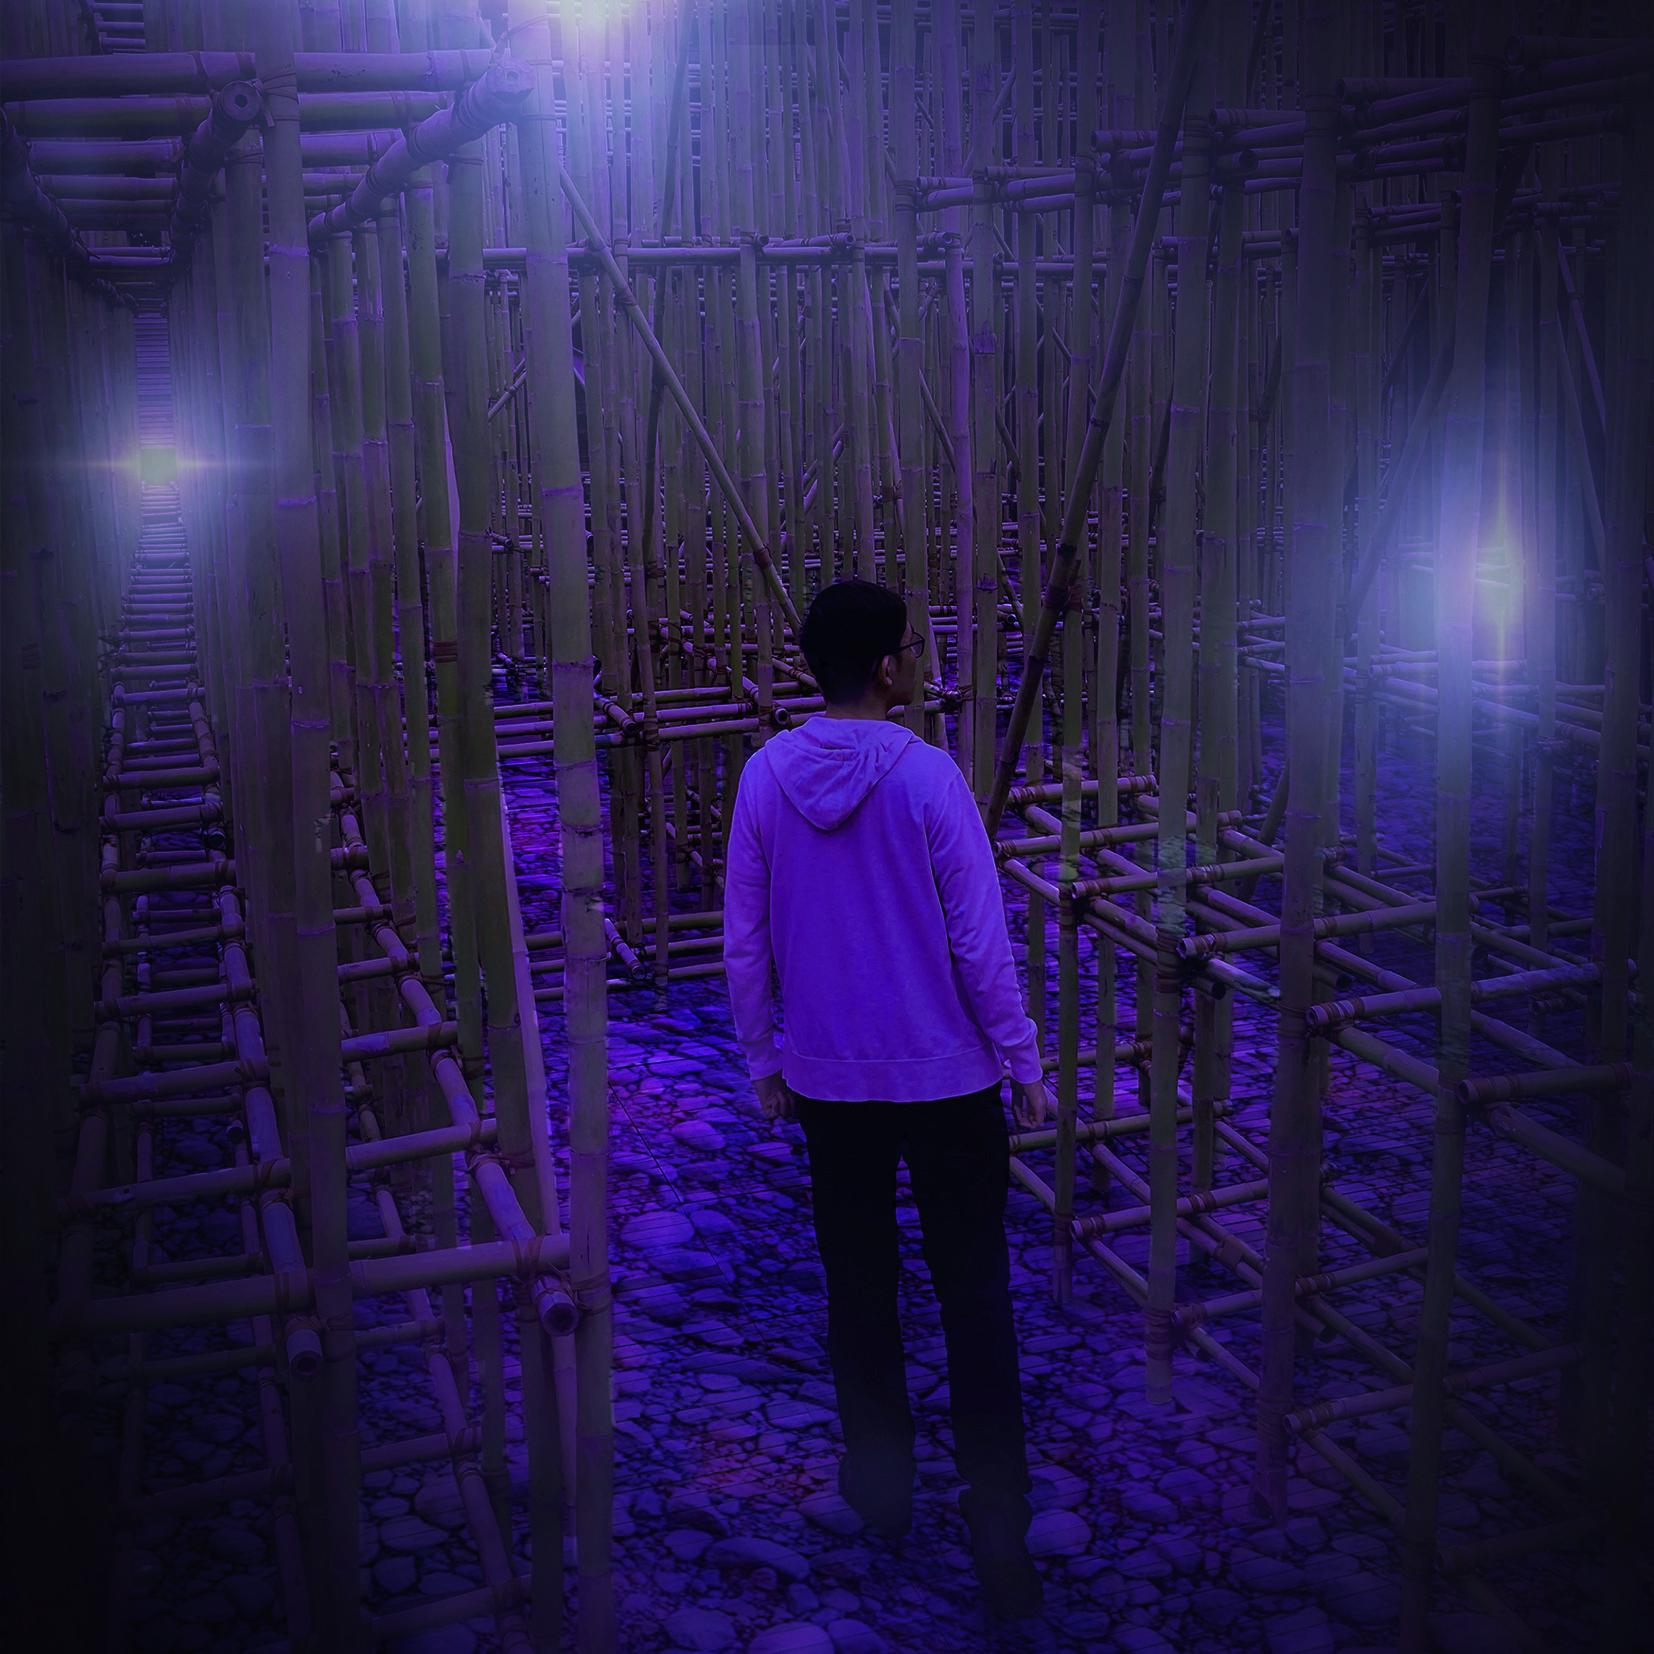 Bamboo Wisps Digital Art by Alvin Sim